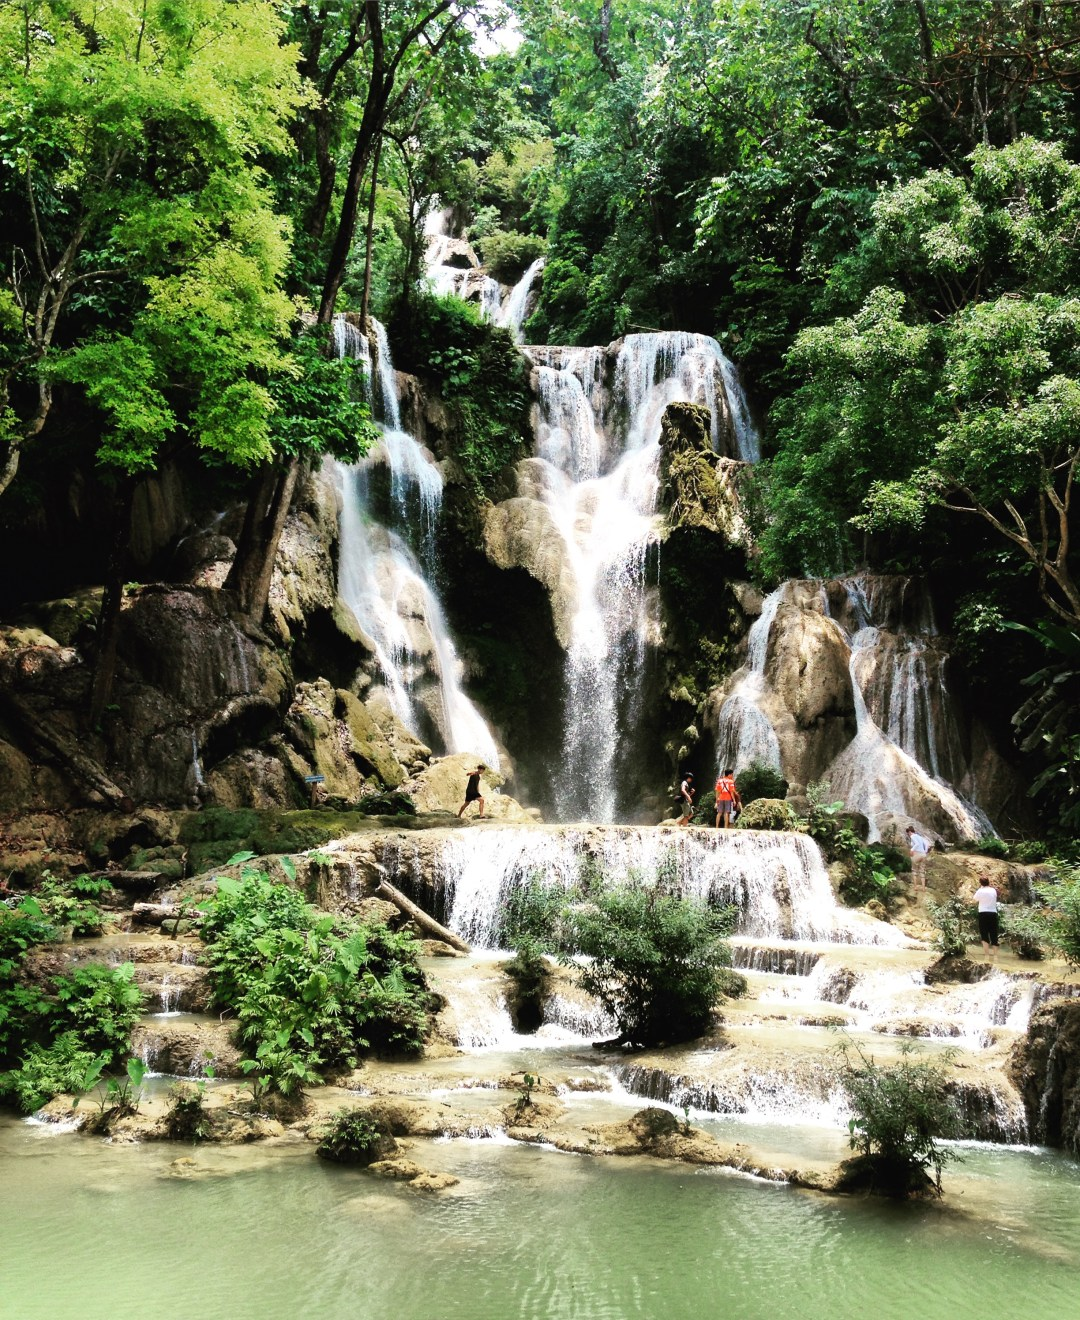 Green jungle surrounds the tall waterfalls